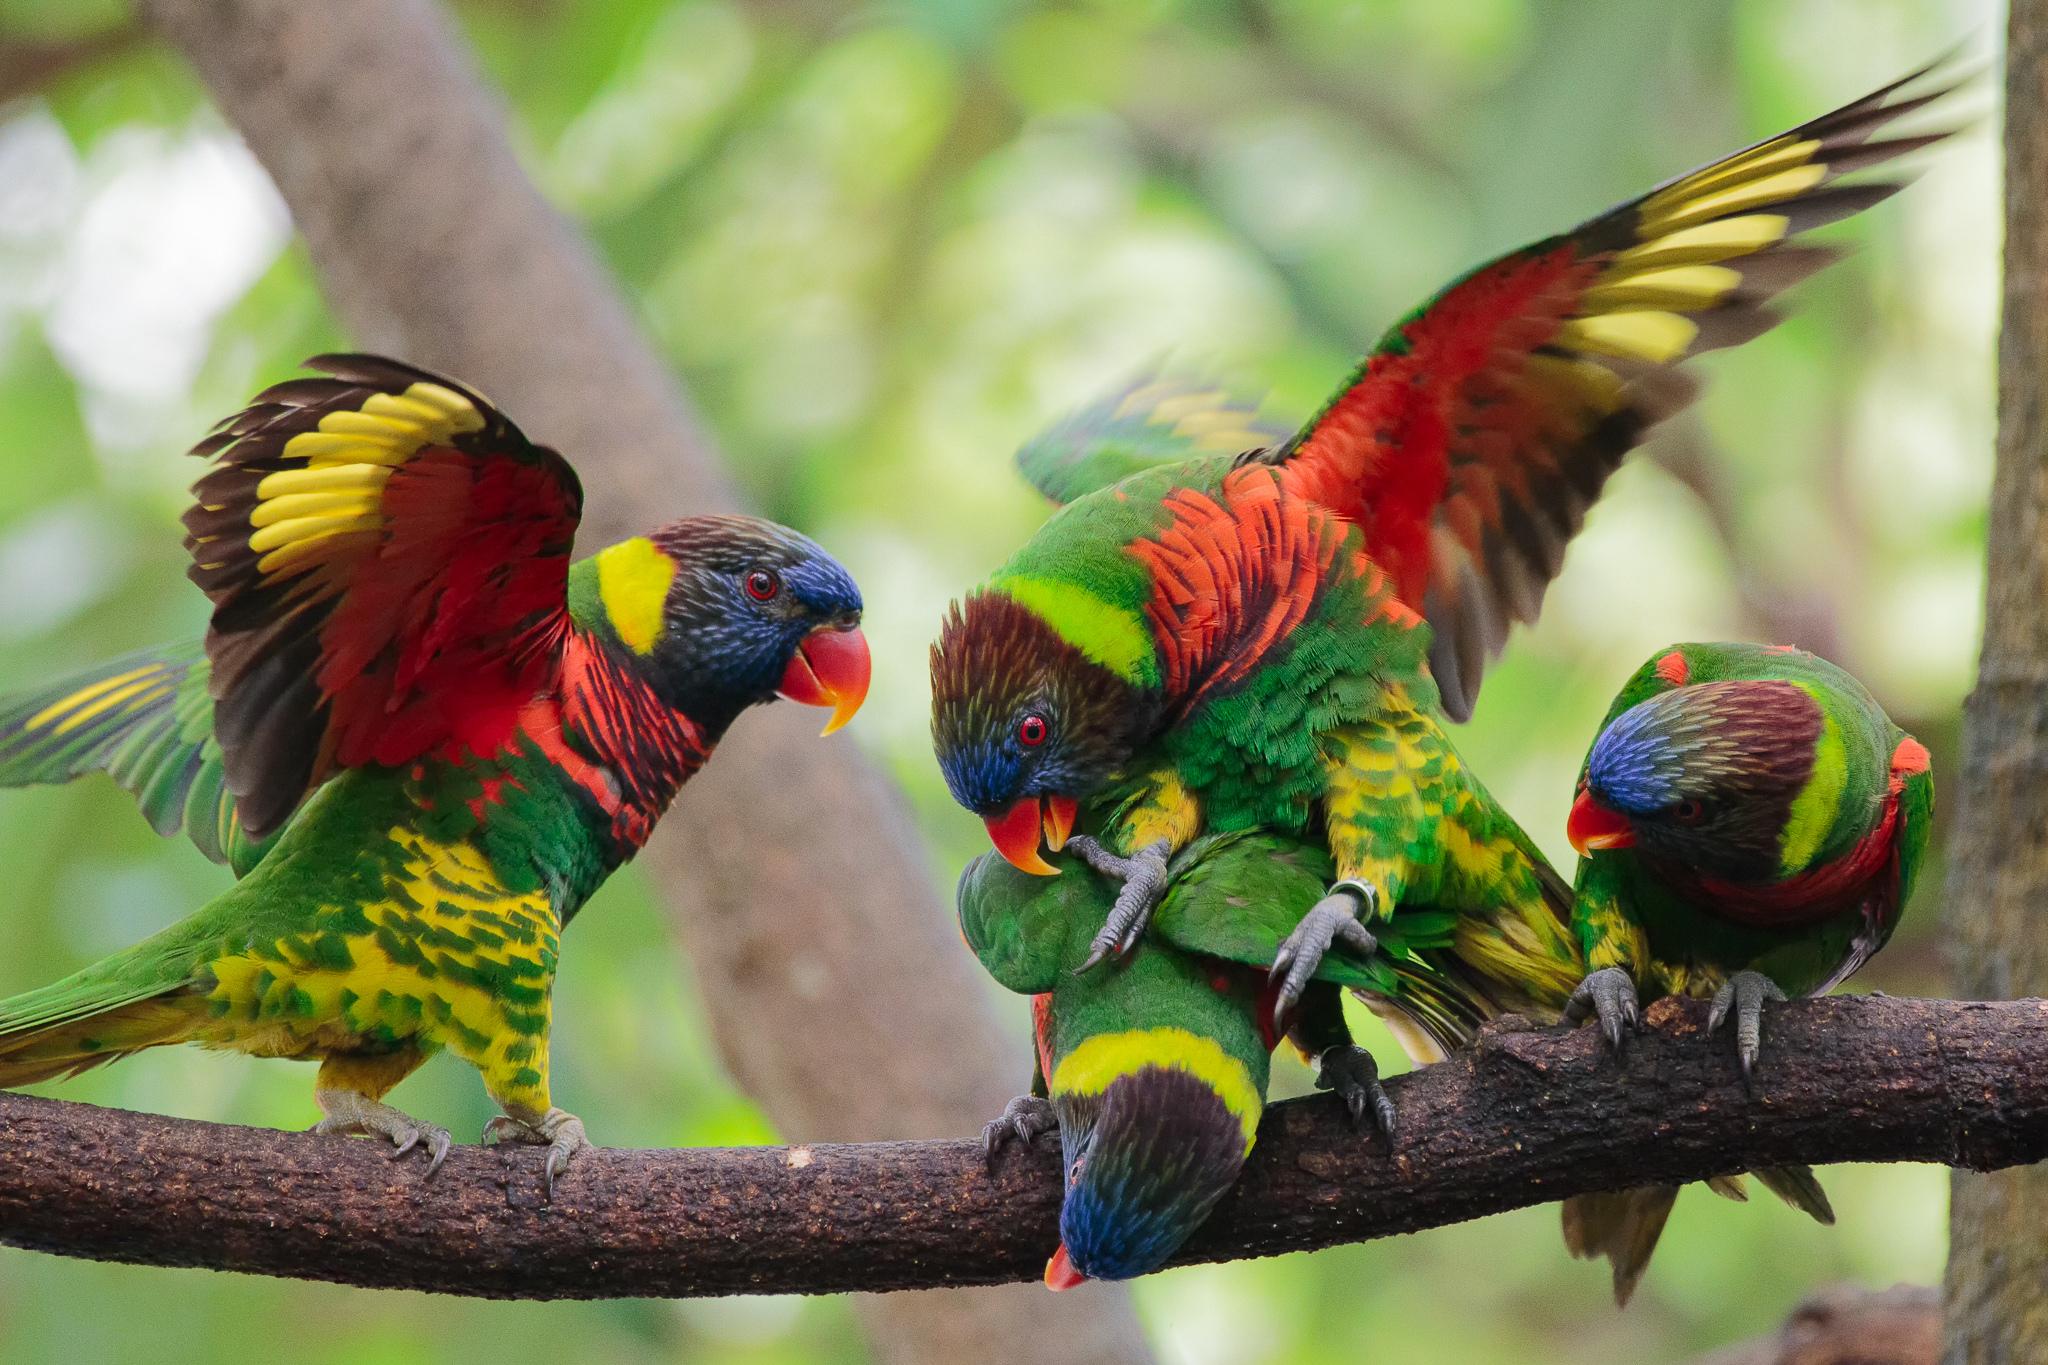 A Beautiful Couple Of Lorikeet Birds Wallpaper Hd: Colorful Rainbow Lorikeets HD Wallpaper